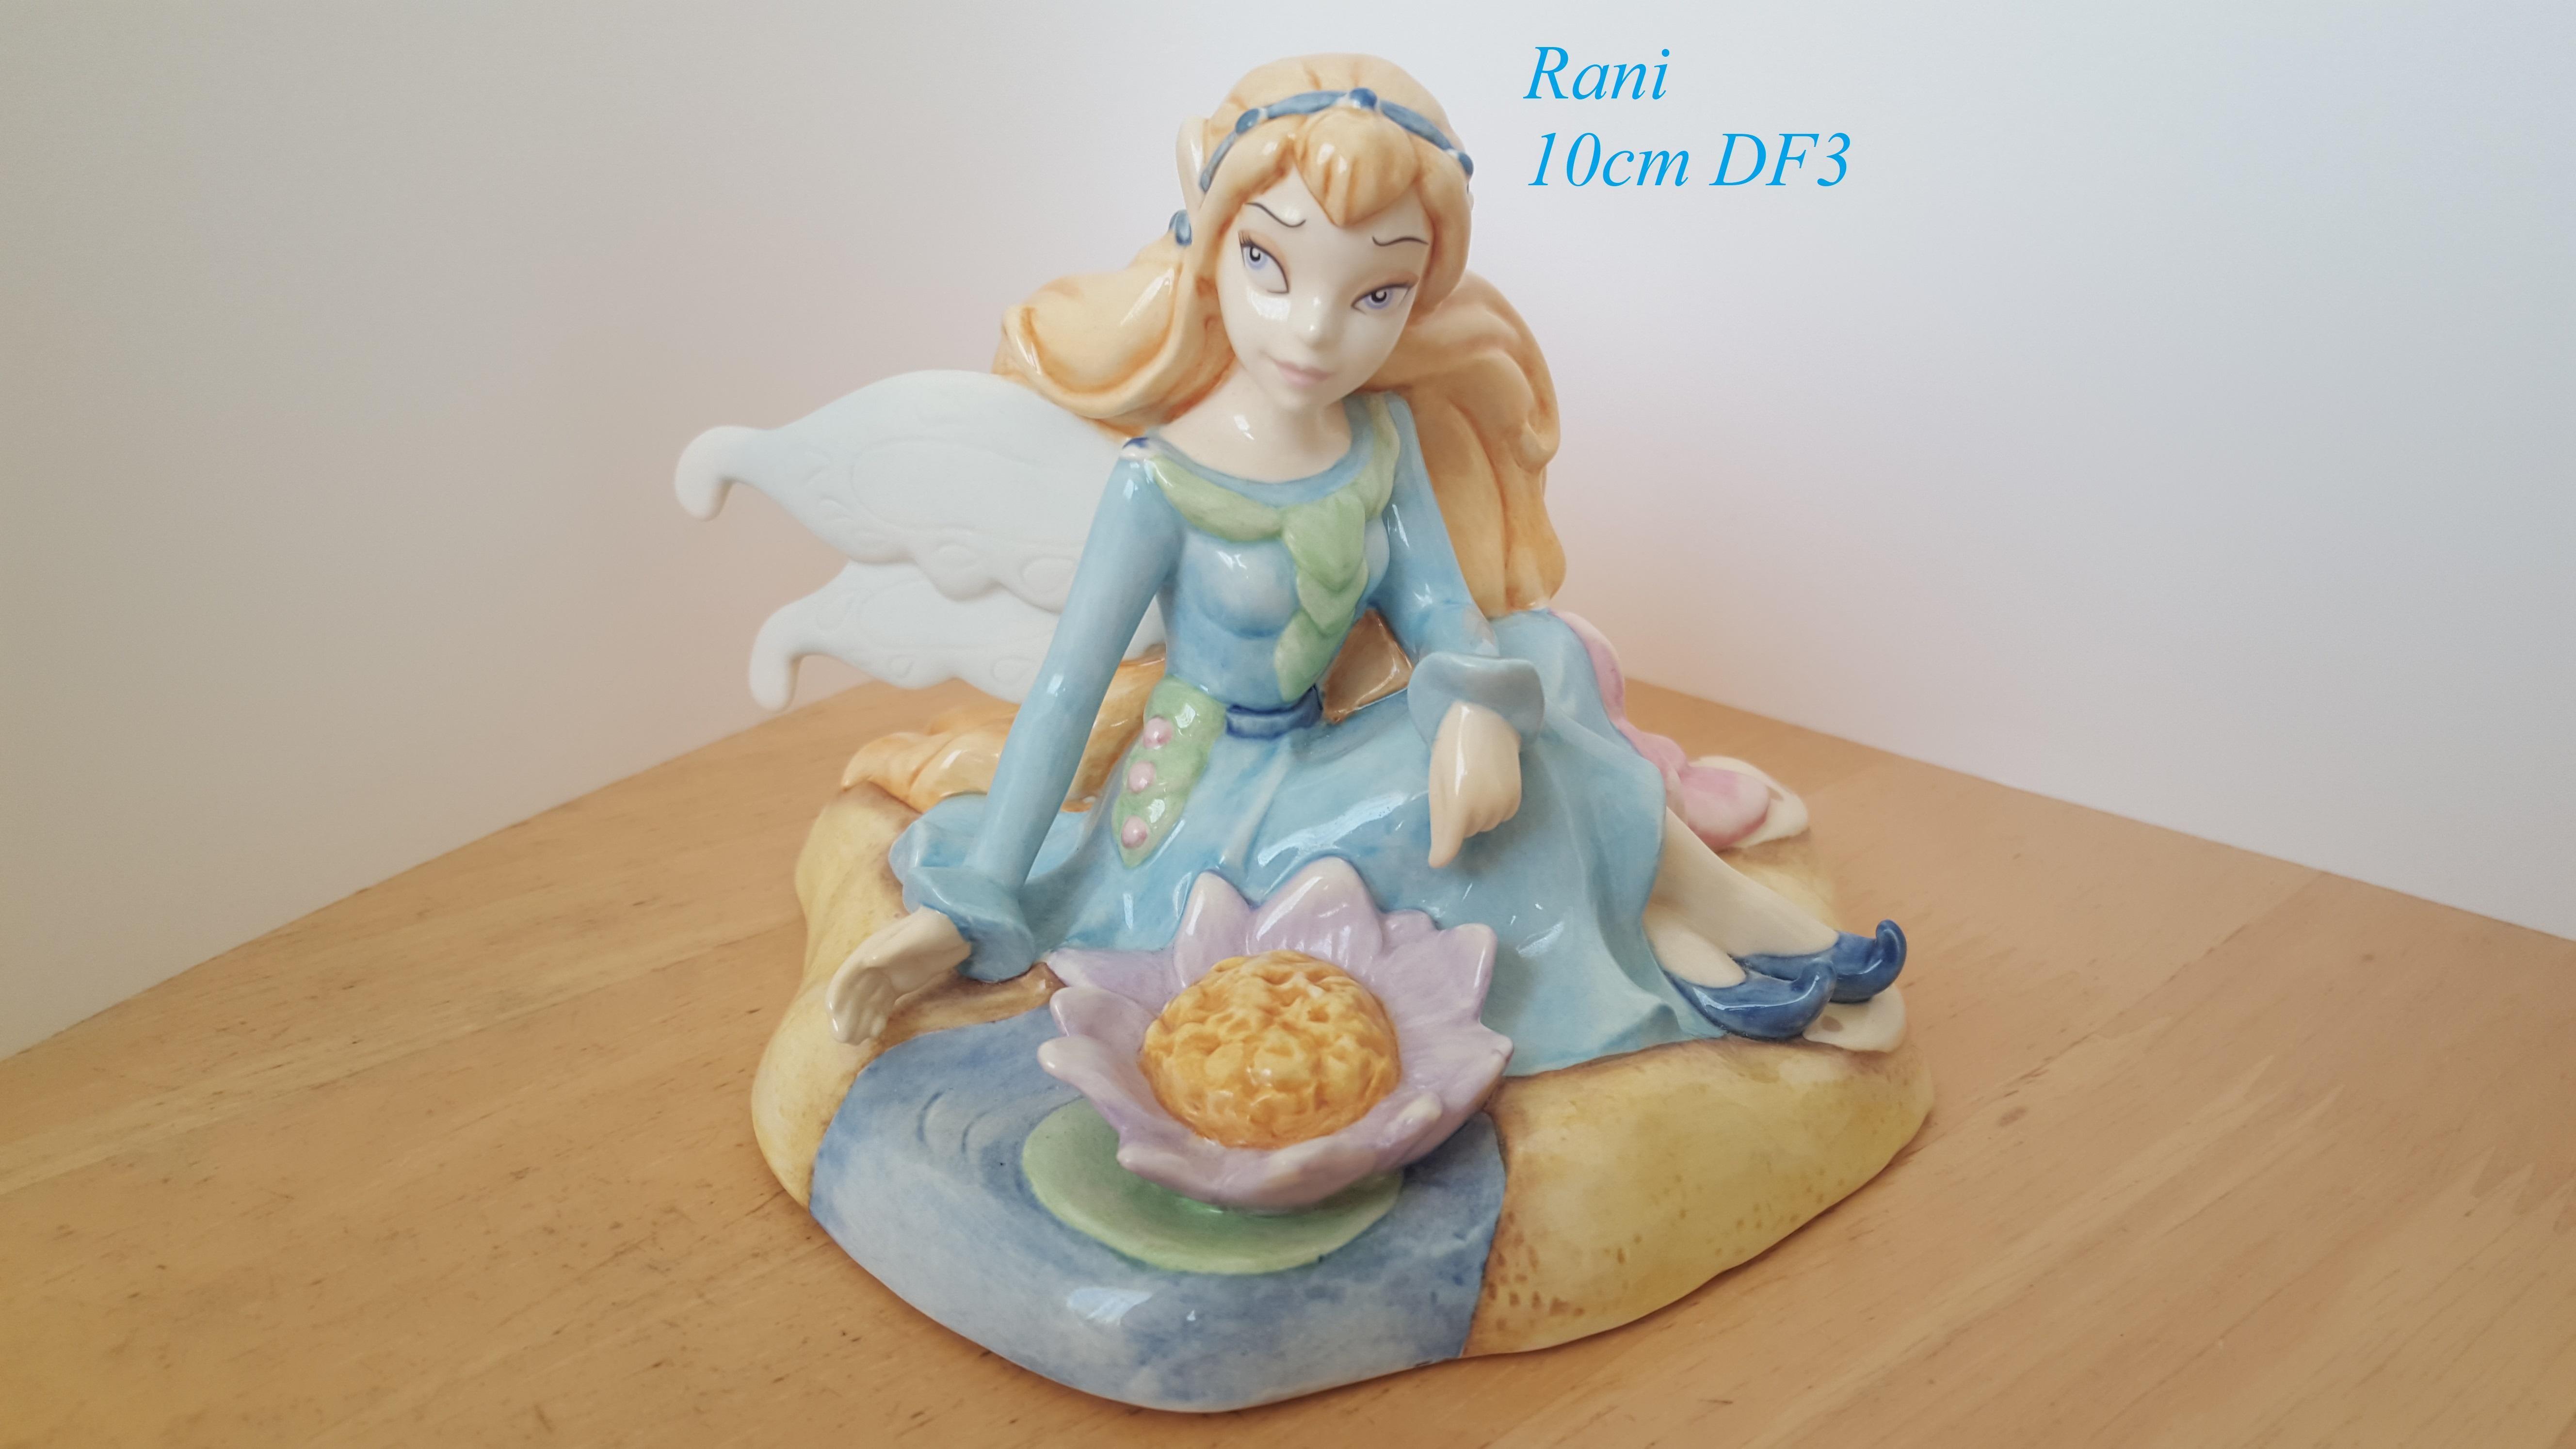 ROYAL DOULTON Disney Fairies Collection Figurine Rani 10cm